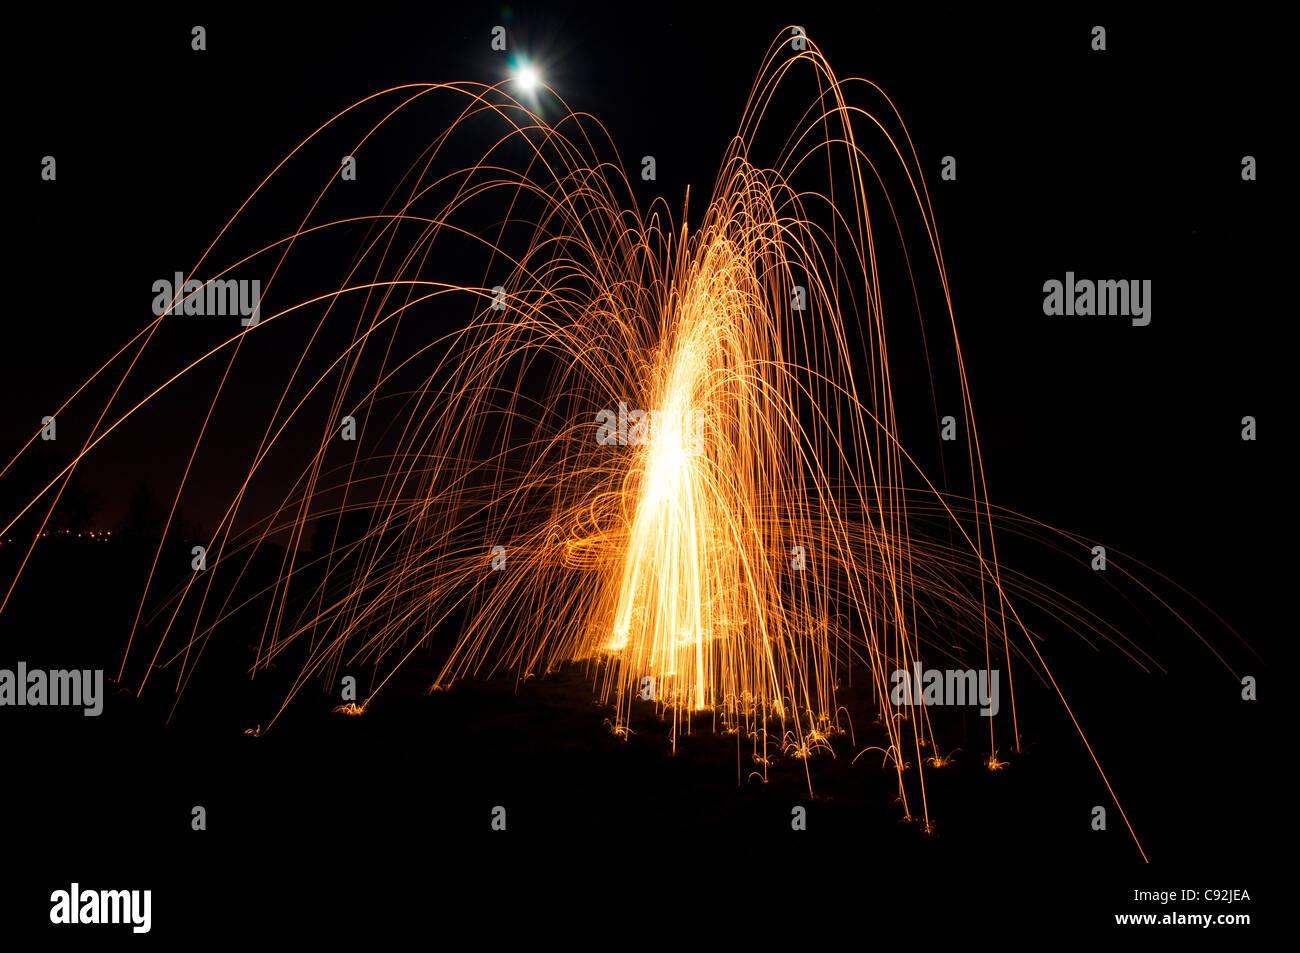 Thick Wire Stockfotos & Thick Wire Bilder - Alamy